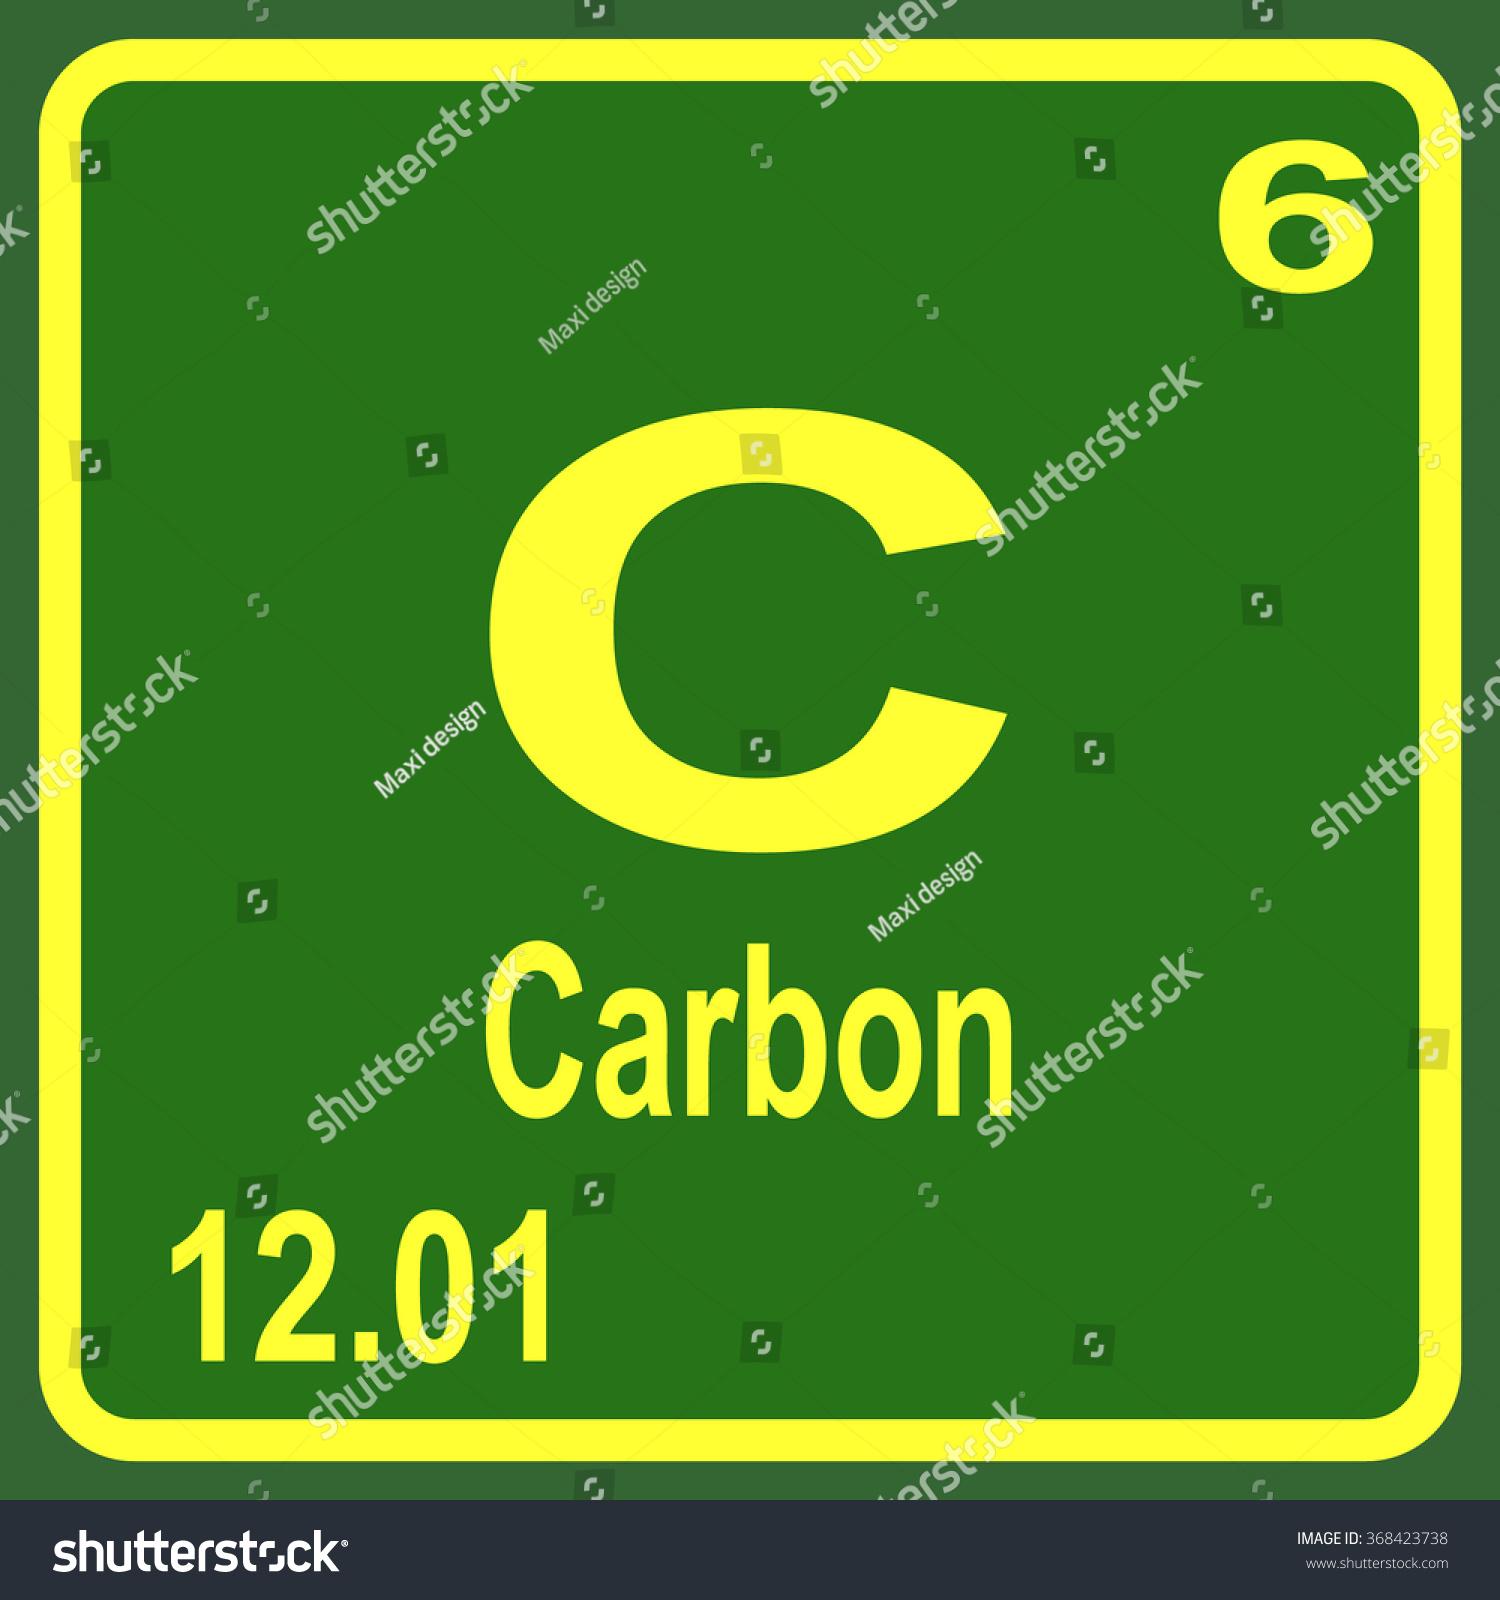 26th element periodic table images periodic table images carbon element periodic table images periodic table images carbon element periodic table choice image periodic table gamestrikefo Image collections